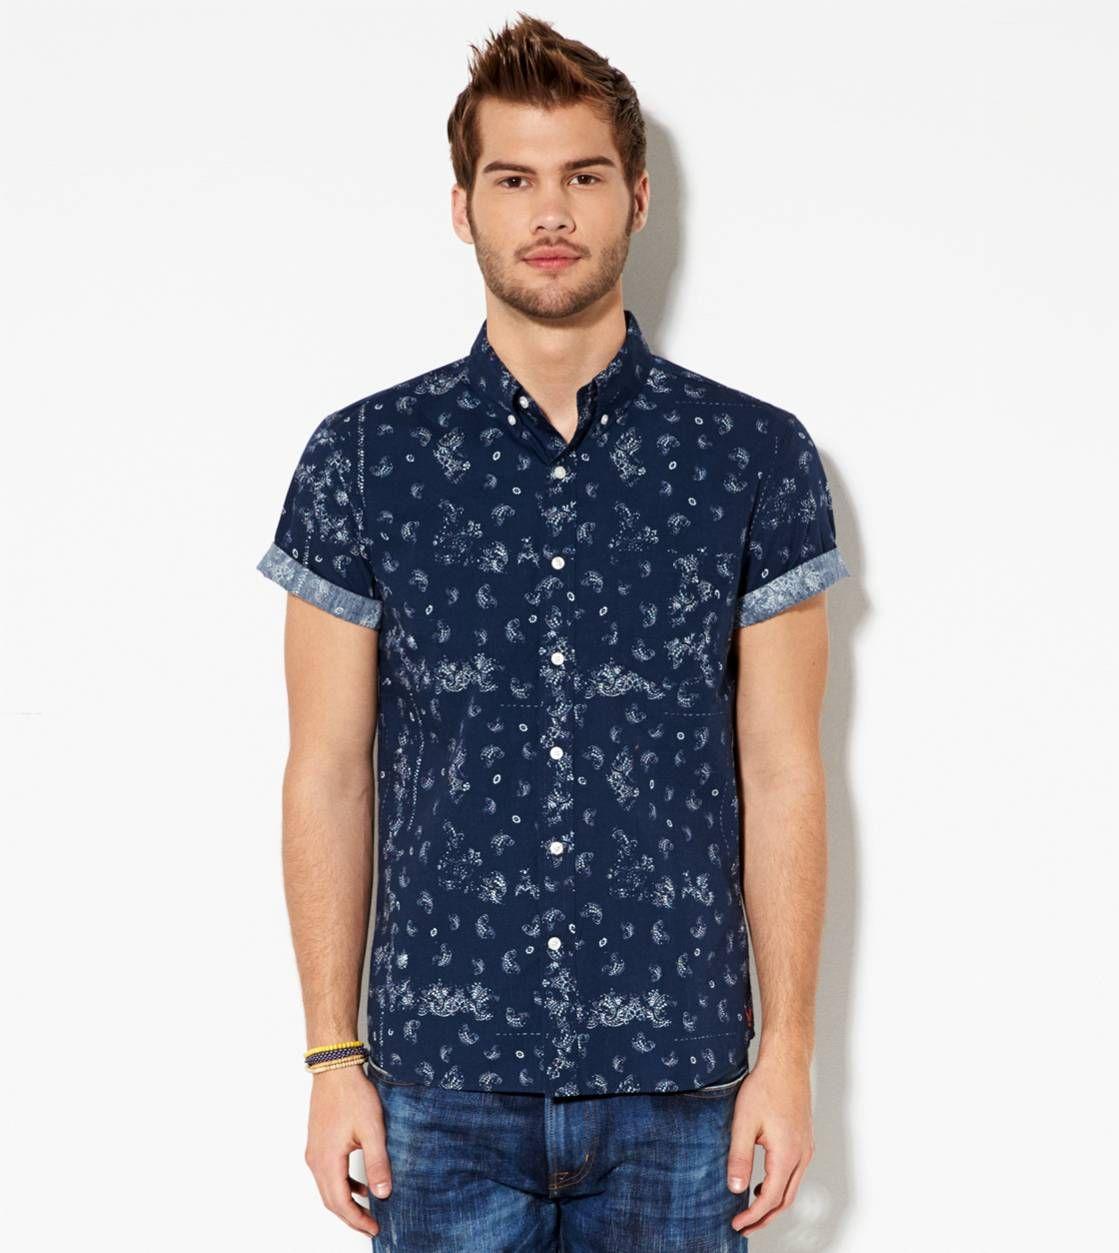 button up short sleeve shirts - Google Search | Staff Uniform ...